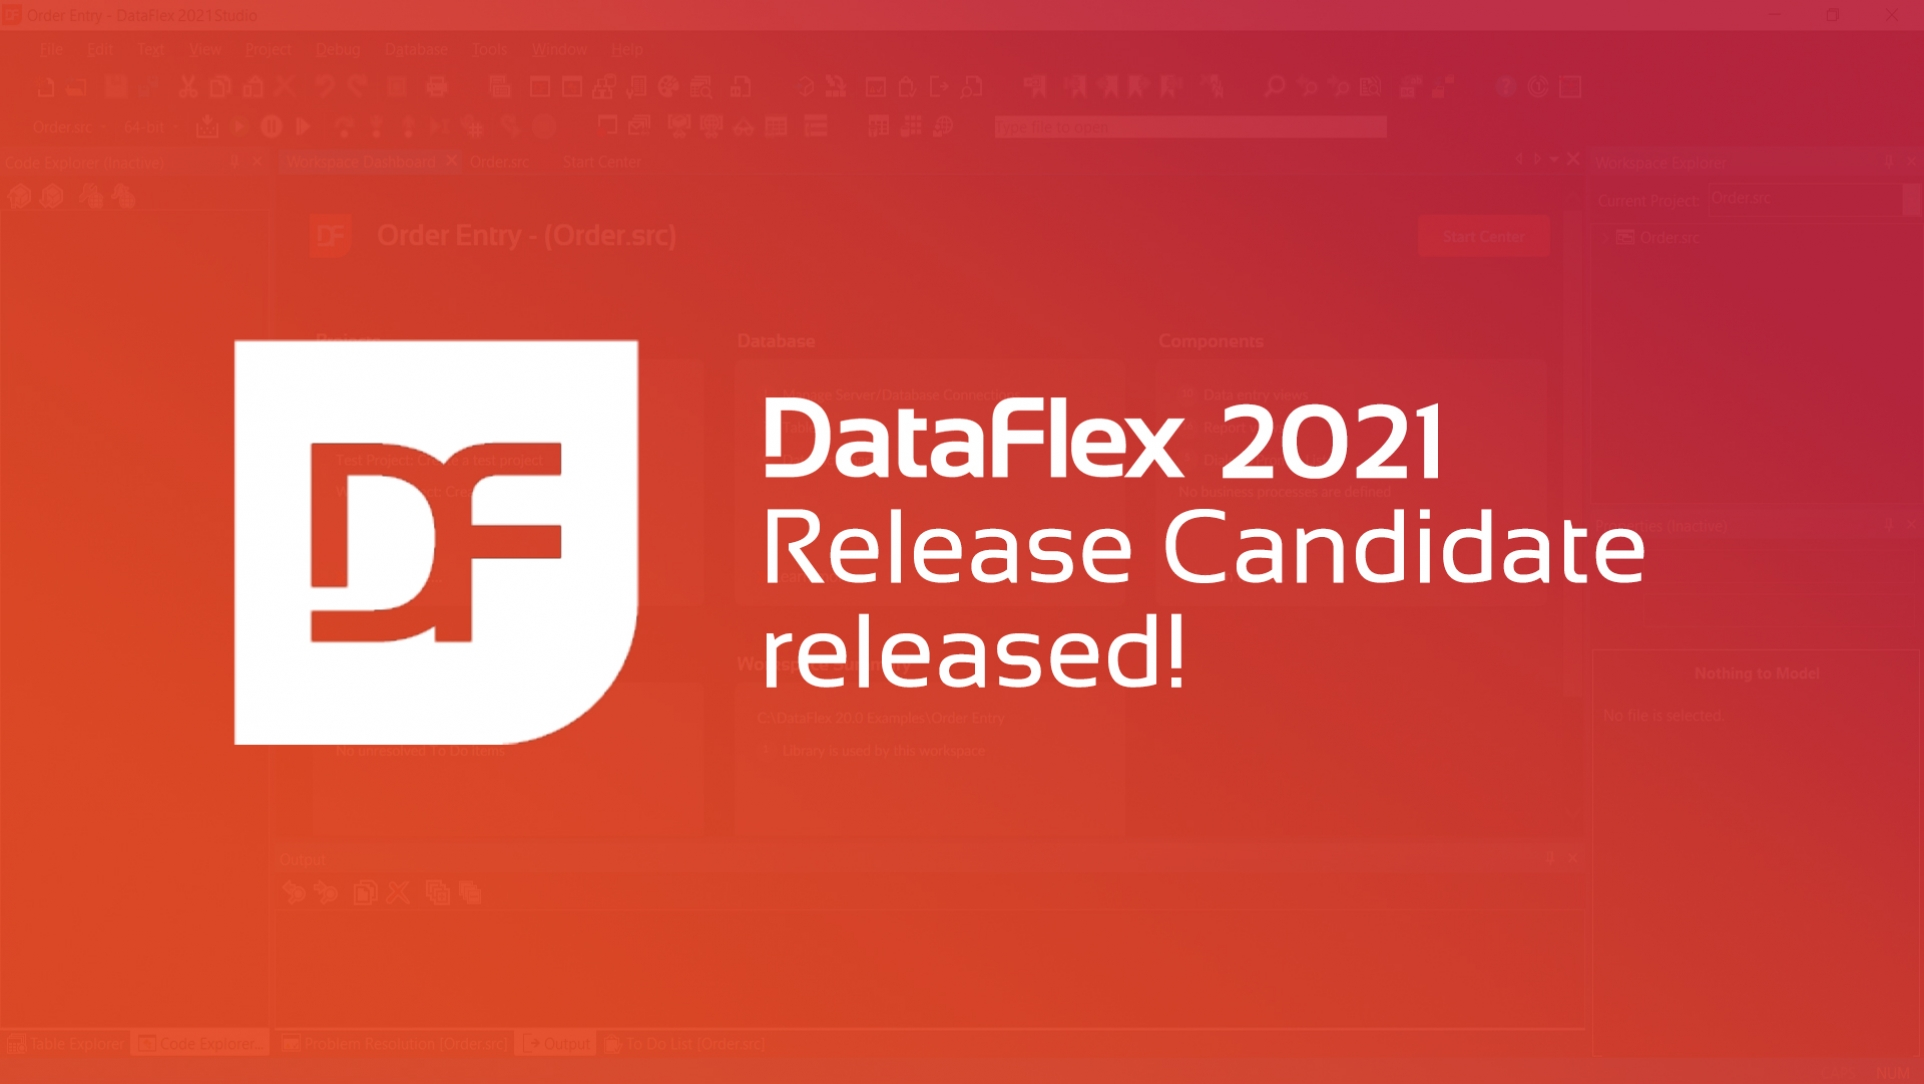 2021-02-06 DataFlex 2021 OG image RC